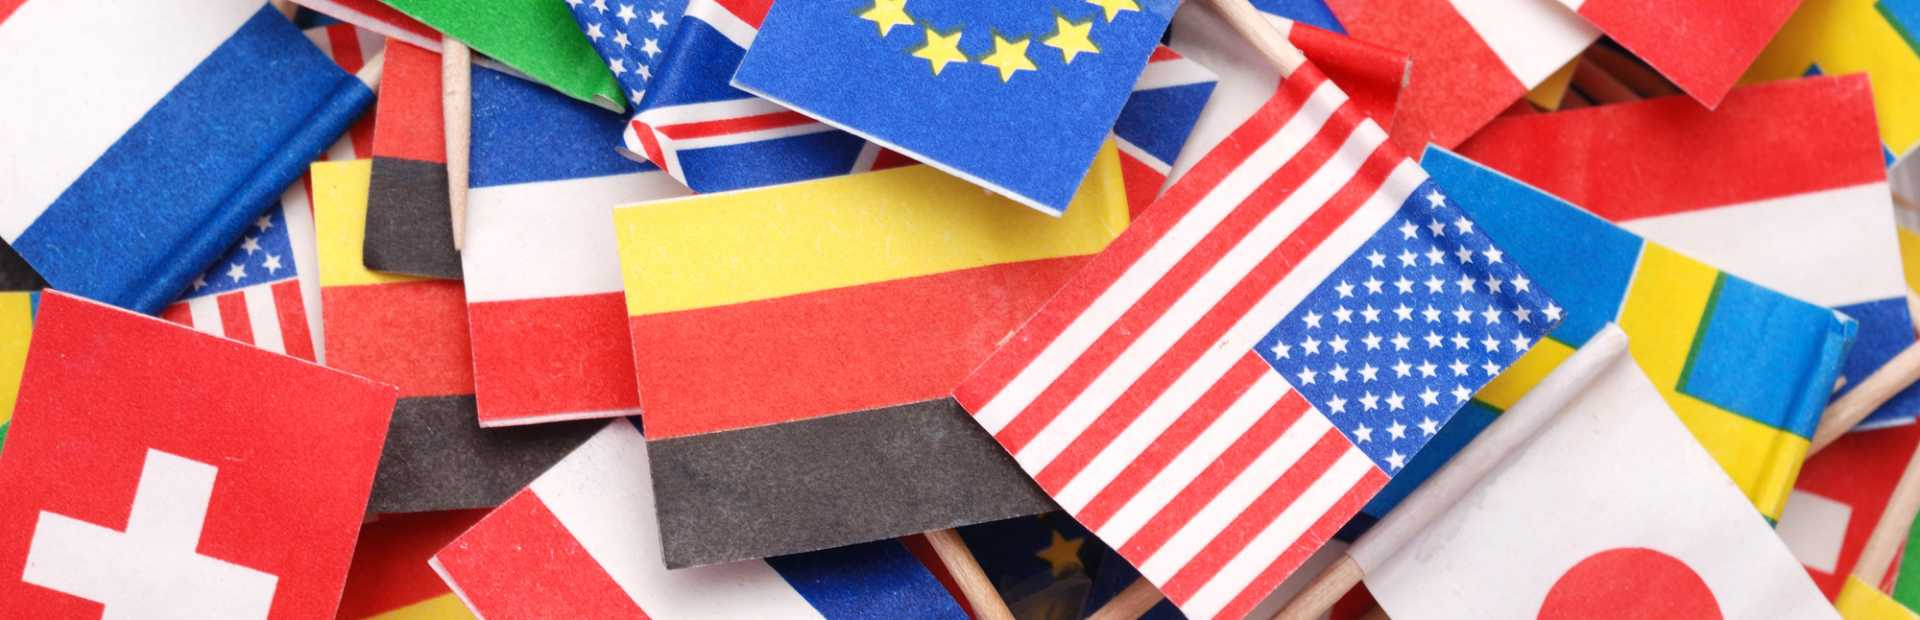 World flags World Trade International America European Union Exports Imports Supply Chain Stock - image courtesy of Depositphotos.